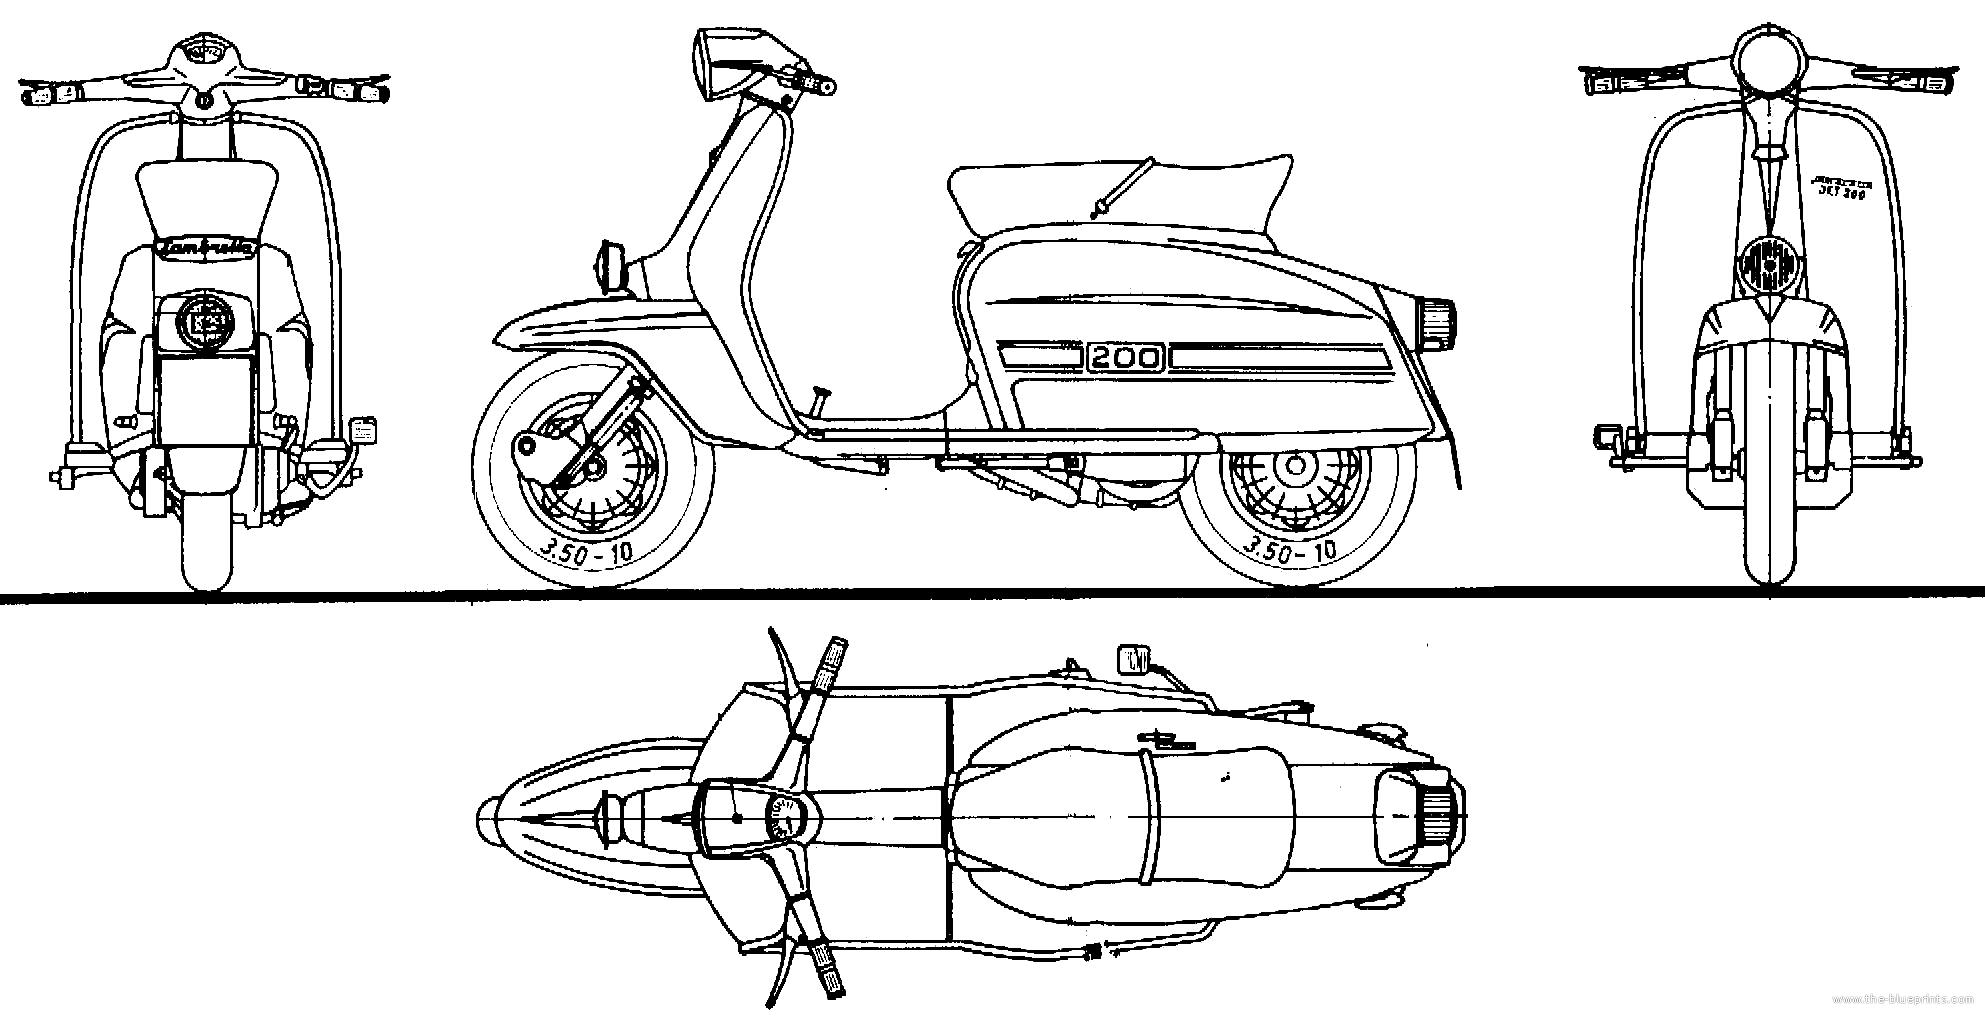 Lambretta-Jet-200-1975_Free_BluePrint_CGfrog_com